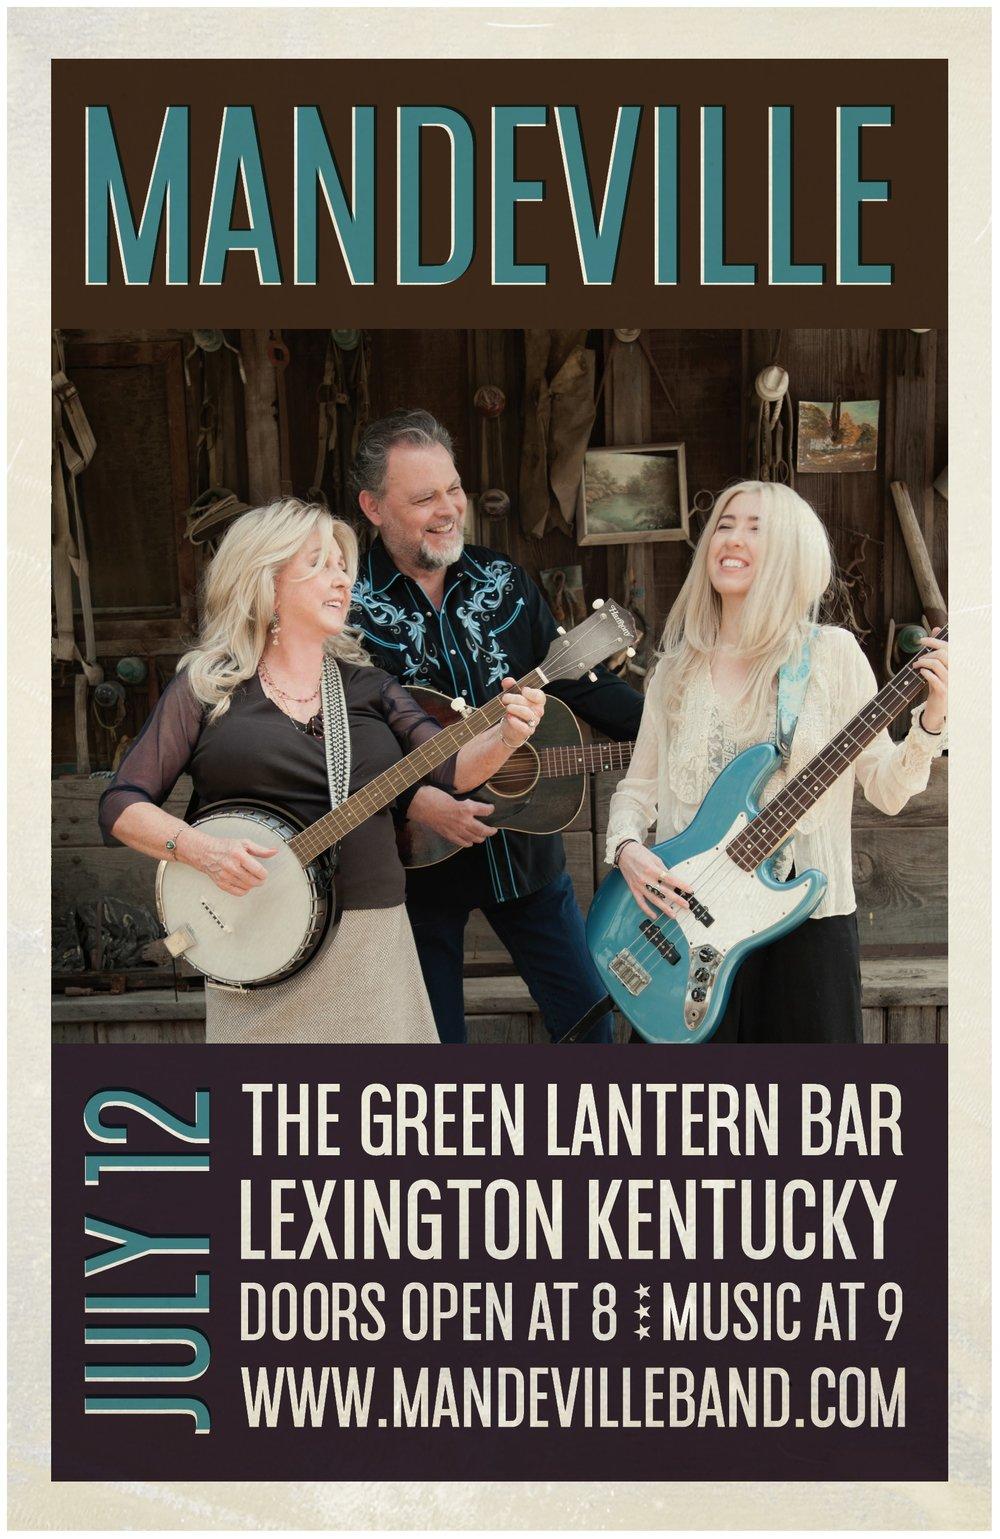 180712 Mandeville Poster-Green Lantern Bar.jpg